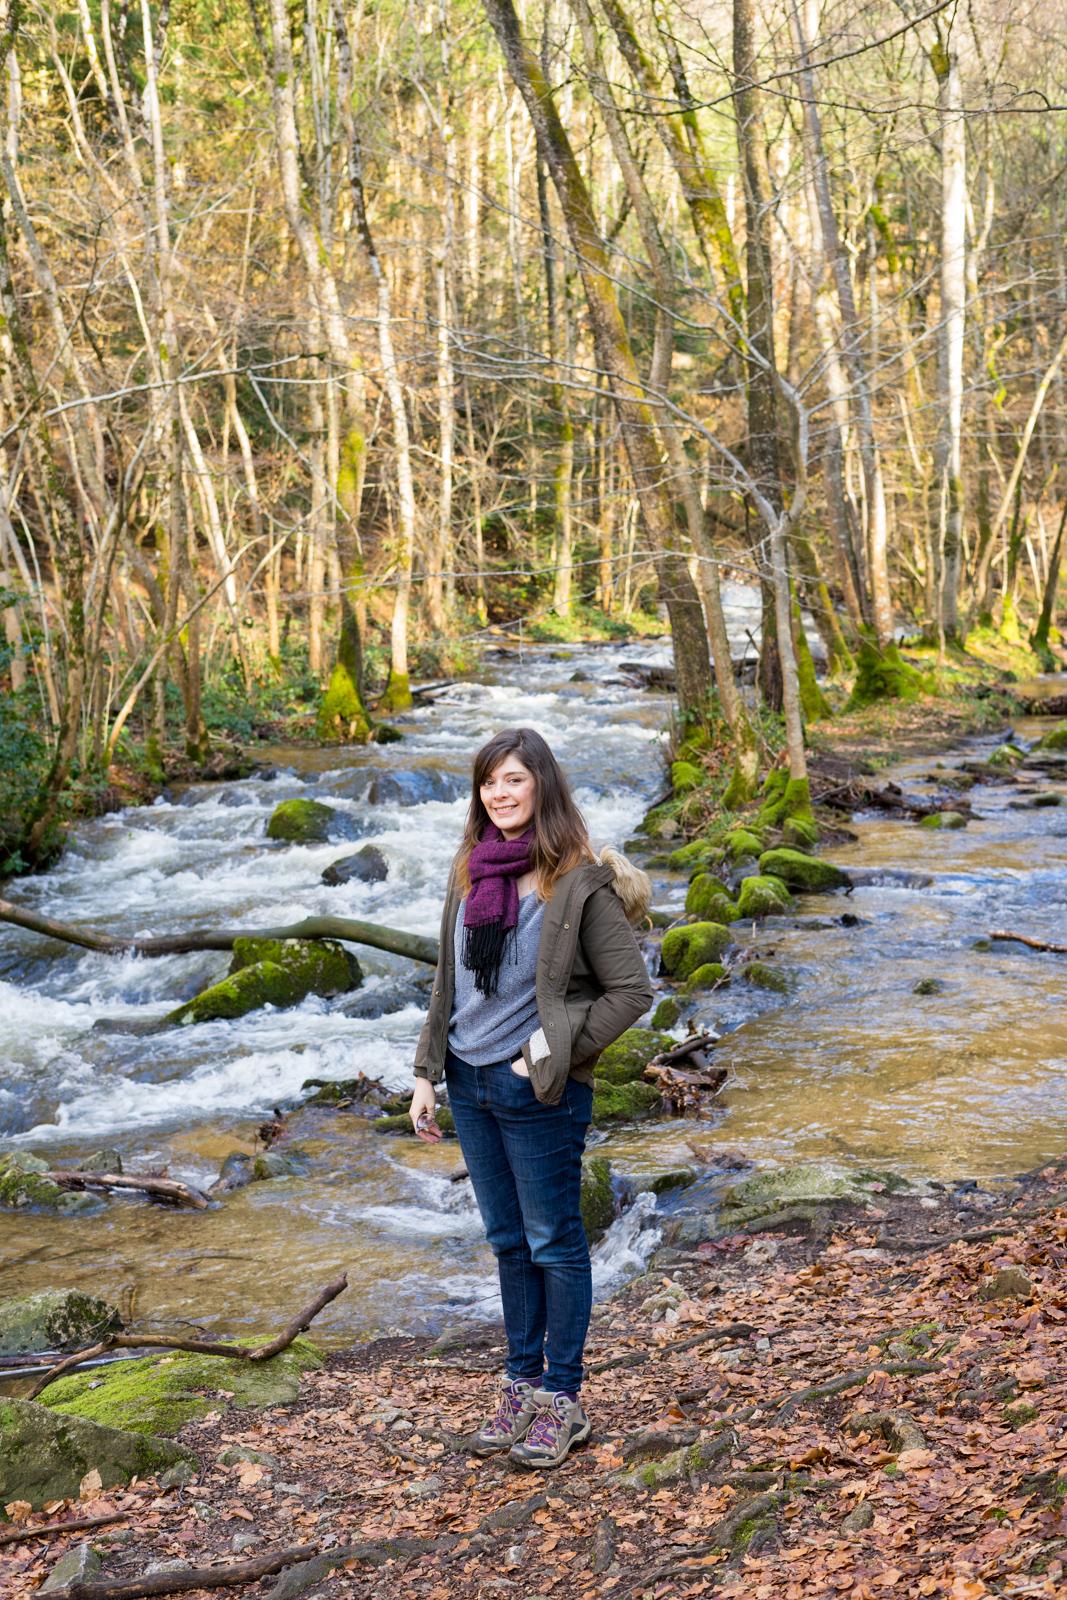 Cascade de la Pisserotte, cascade pisserote, allier hiver, balade cascade allier, balade cascade auvergne, idée balade allier